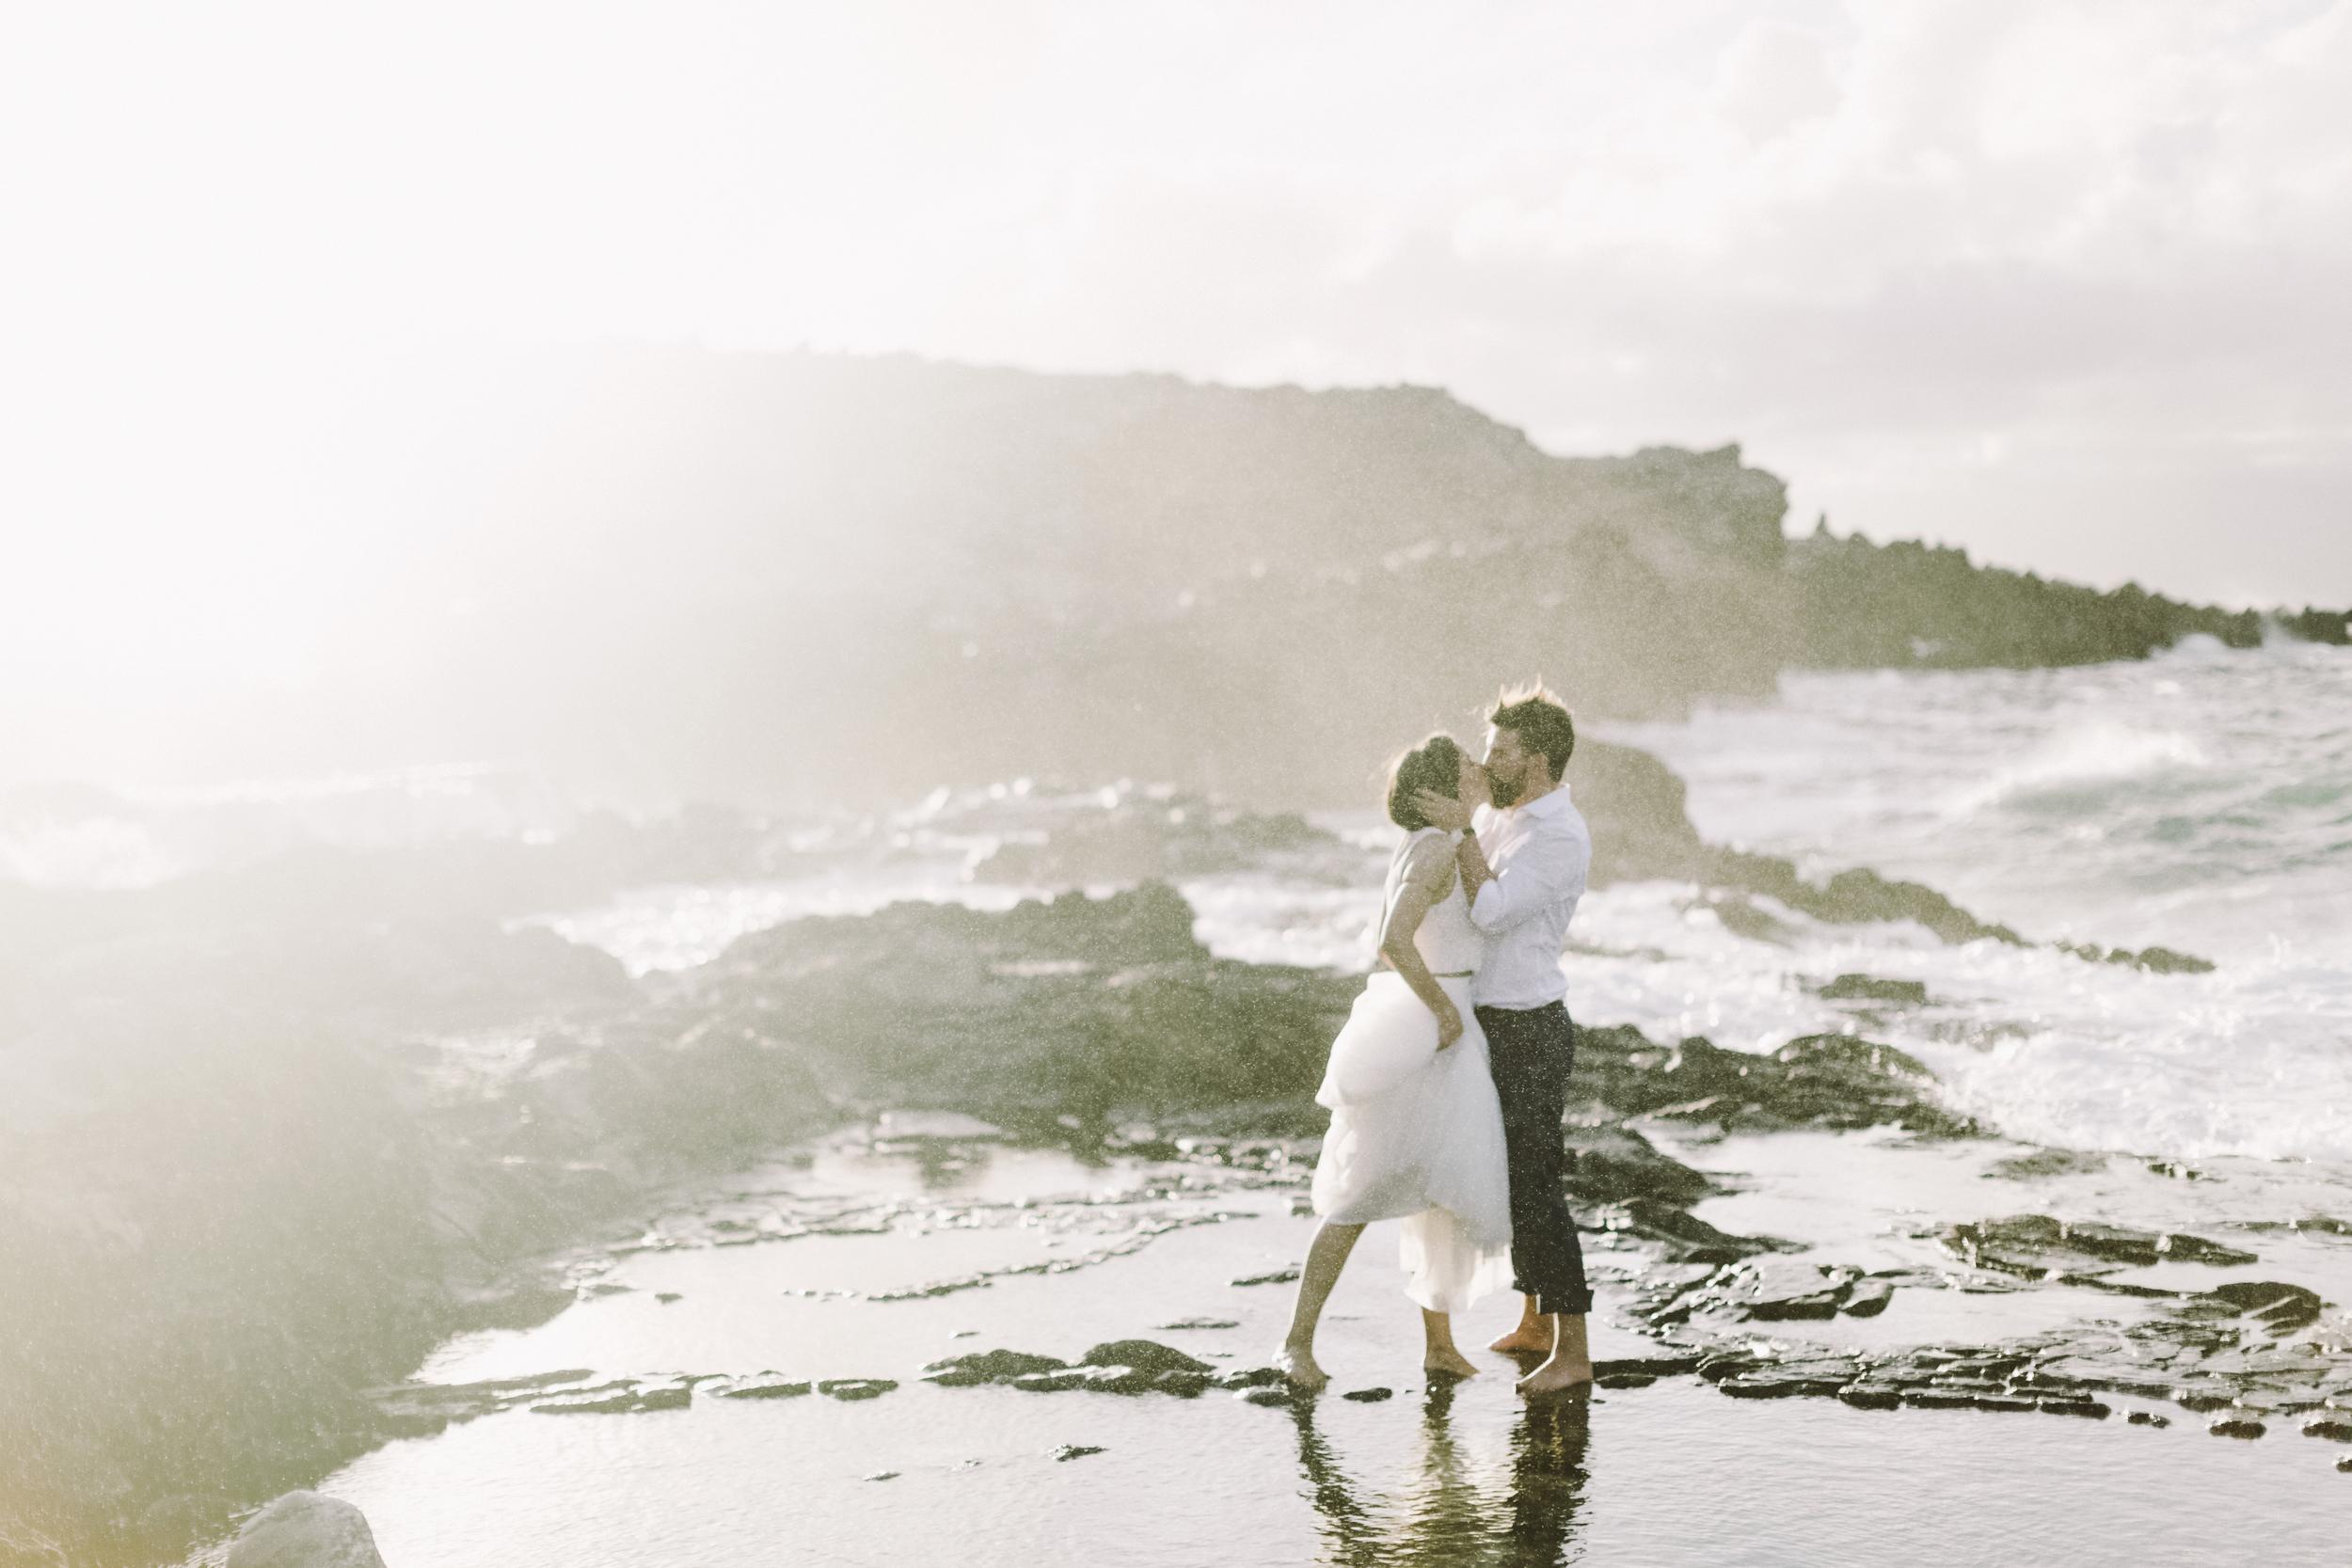 angie-diaz-photography-maui-wedding-ironwoods-beach-60.jpg